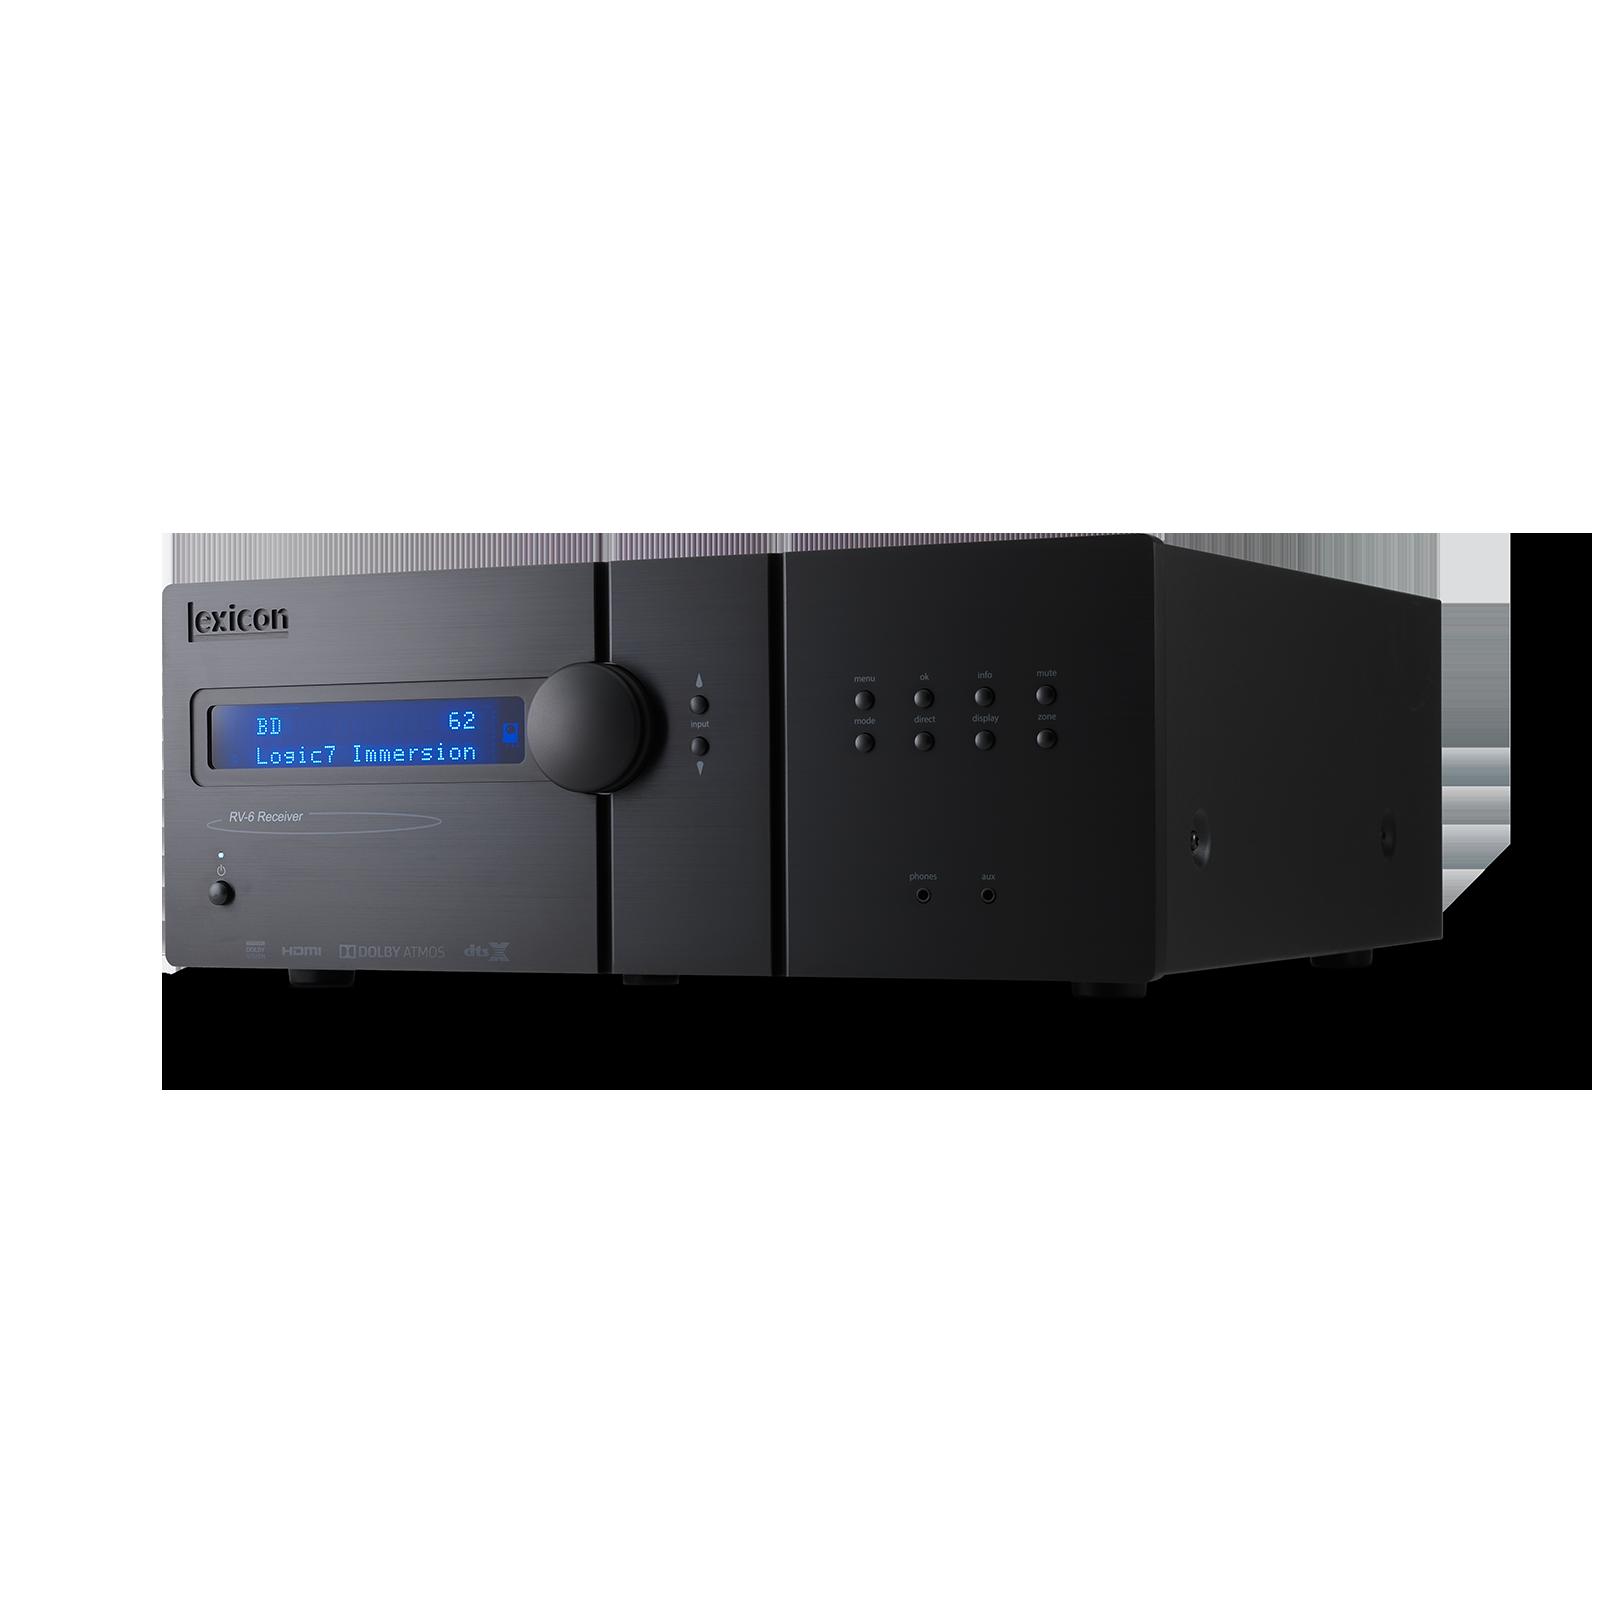 Lexicon RV-6 - Black - Immersive Surround Sound Receiver - Hero